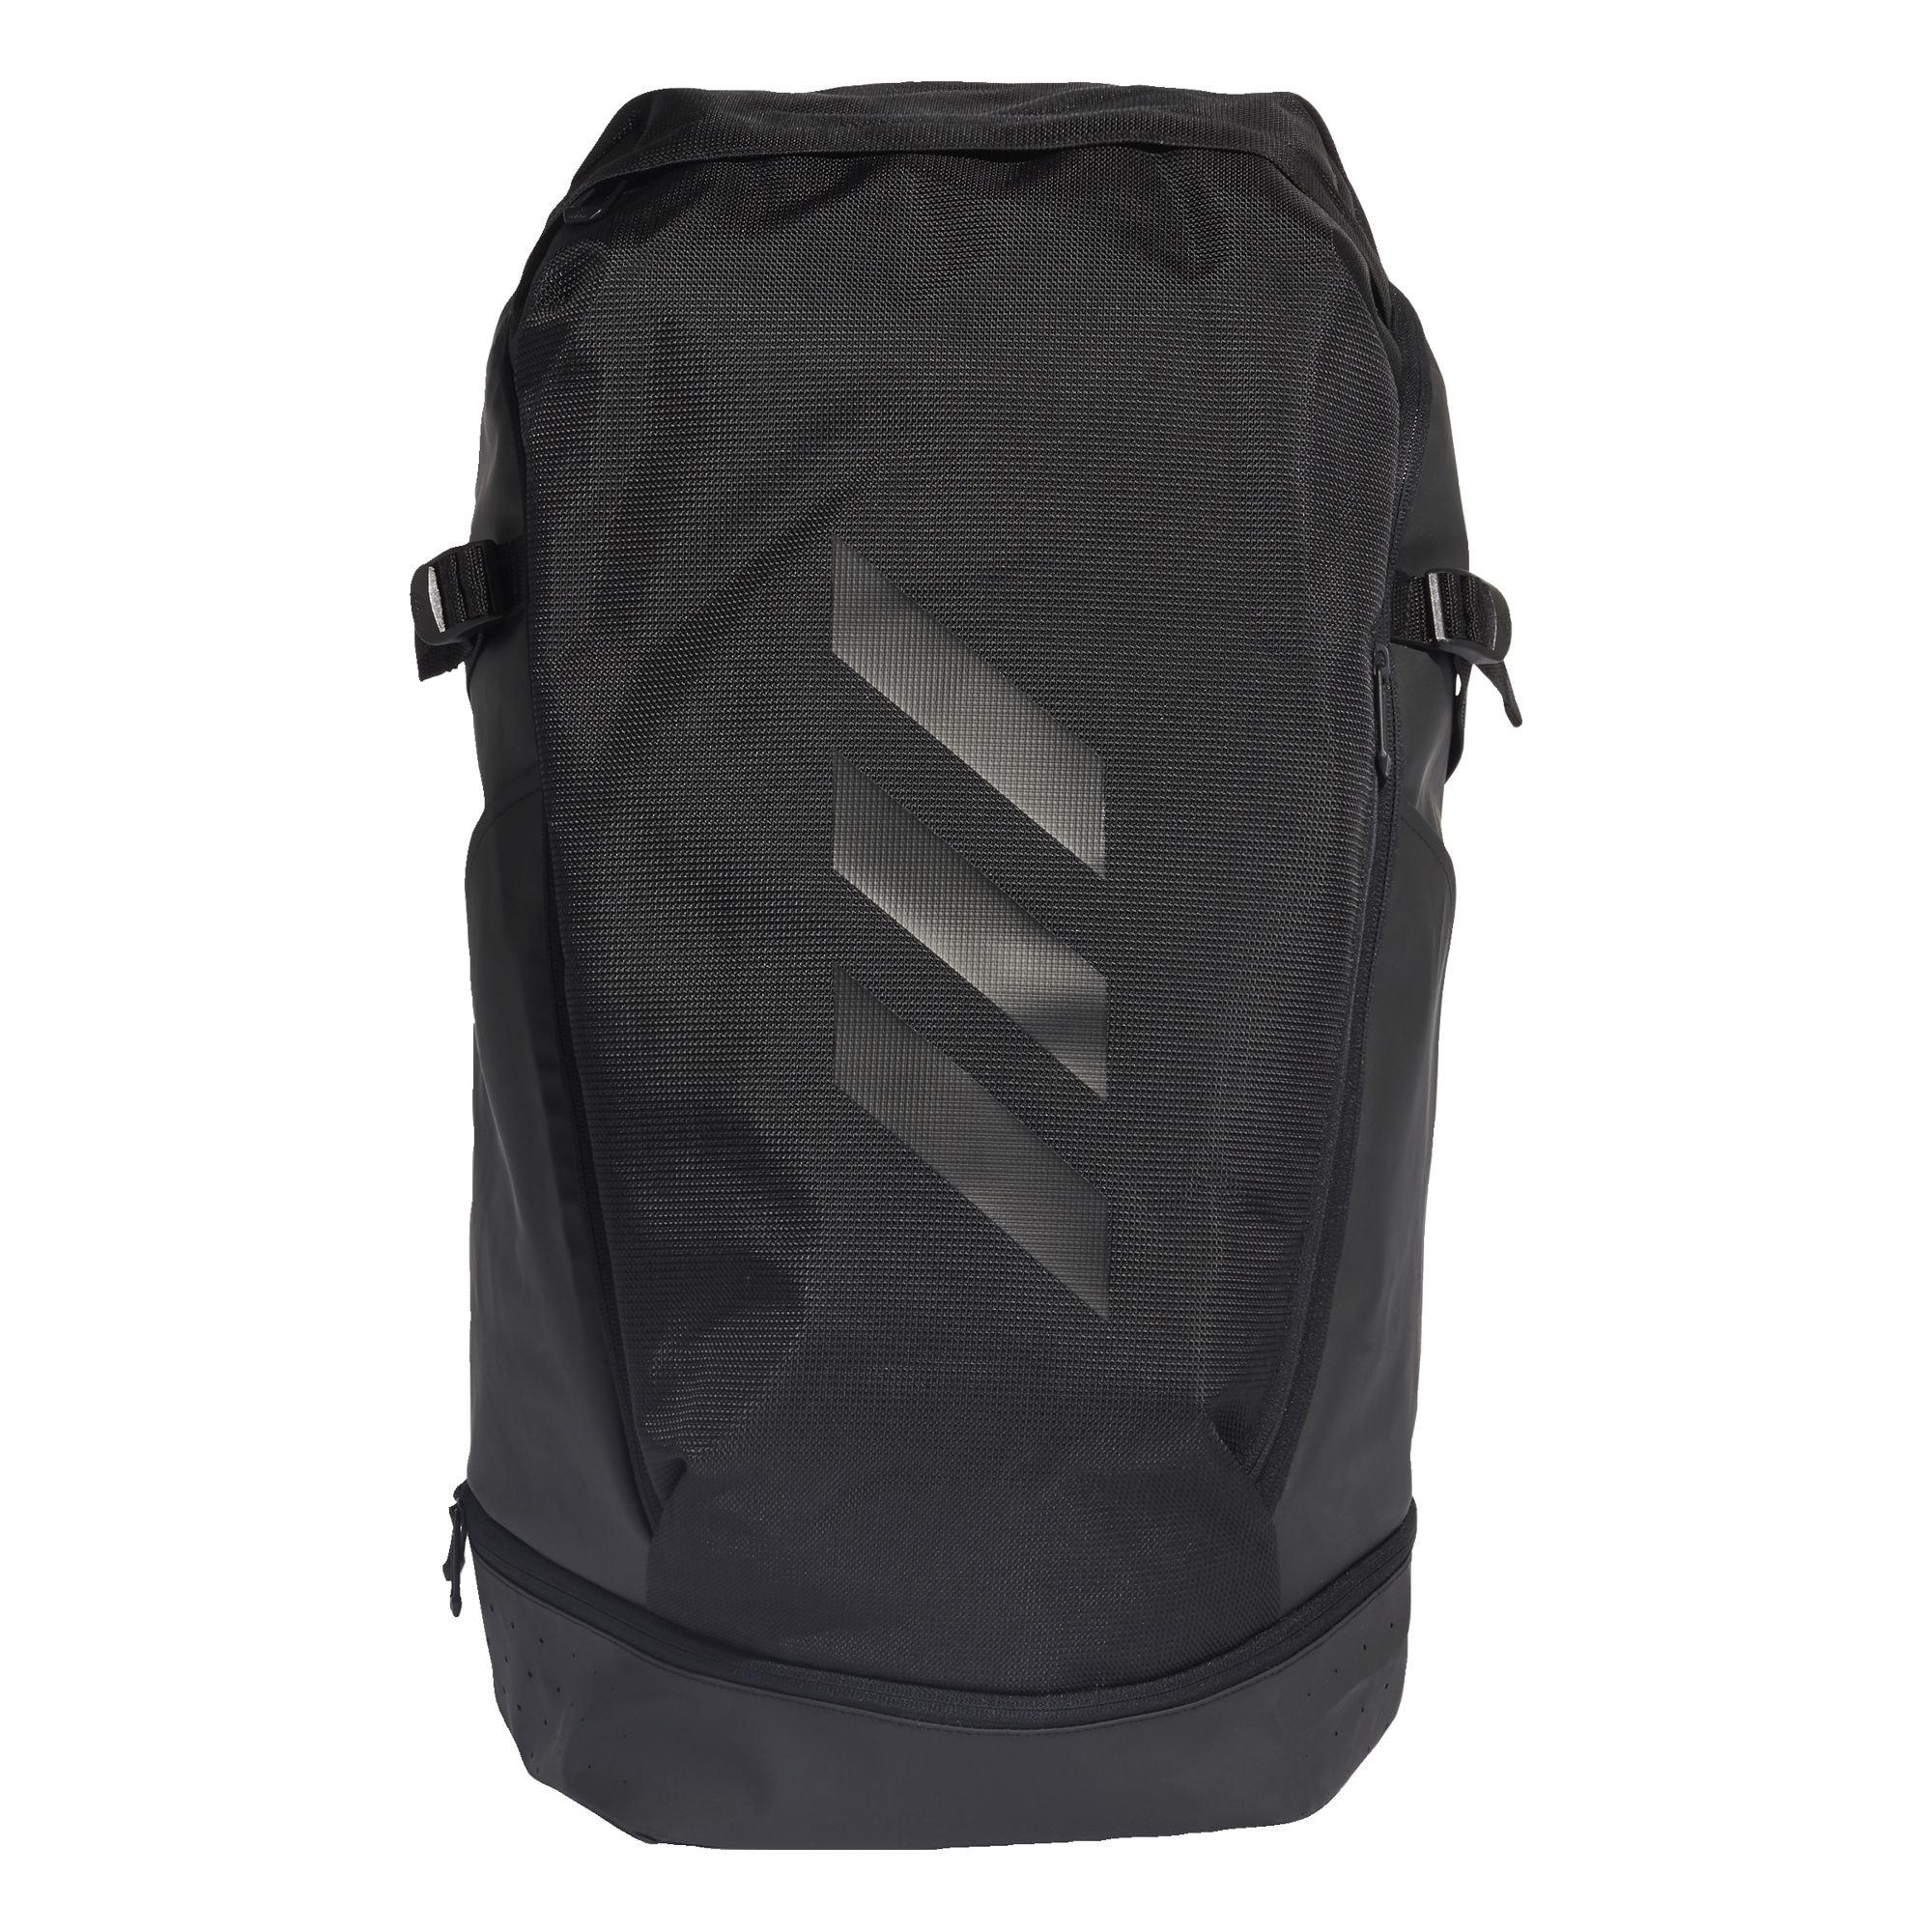 Backpack 'Creator 365'   Taschen > Rucksäcke > Tourenrucksäcke   adidas performance